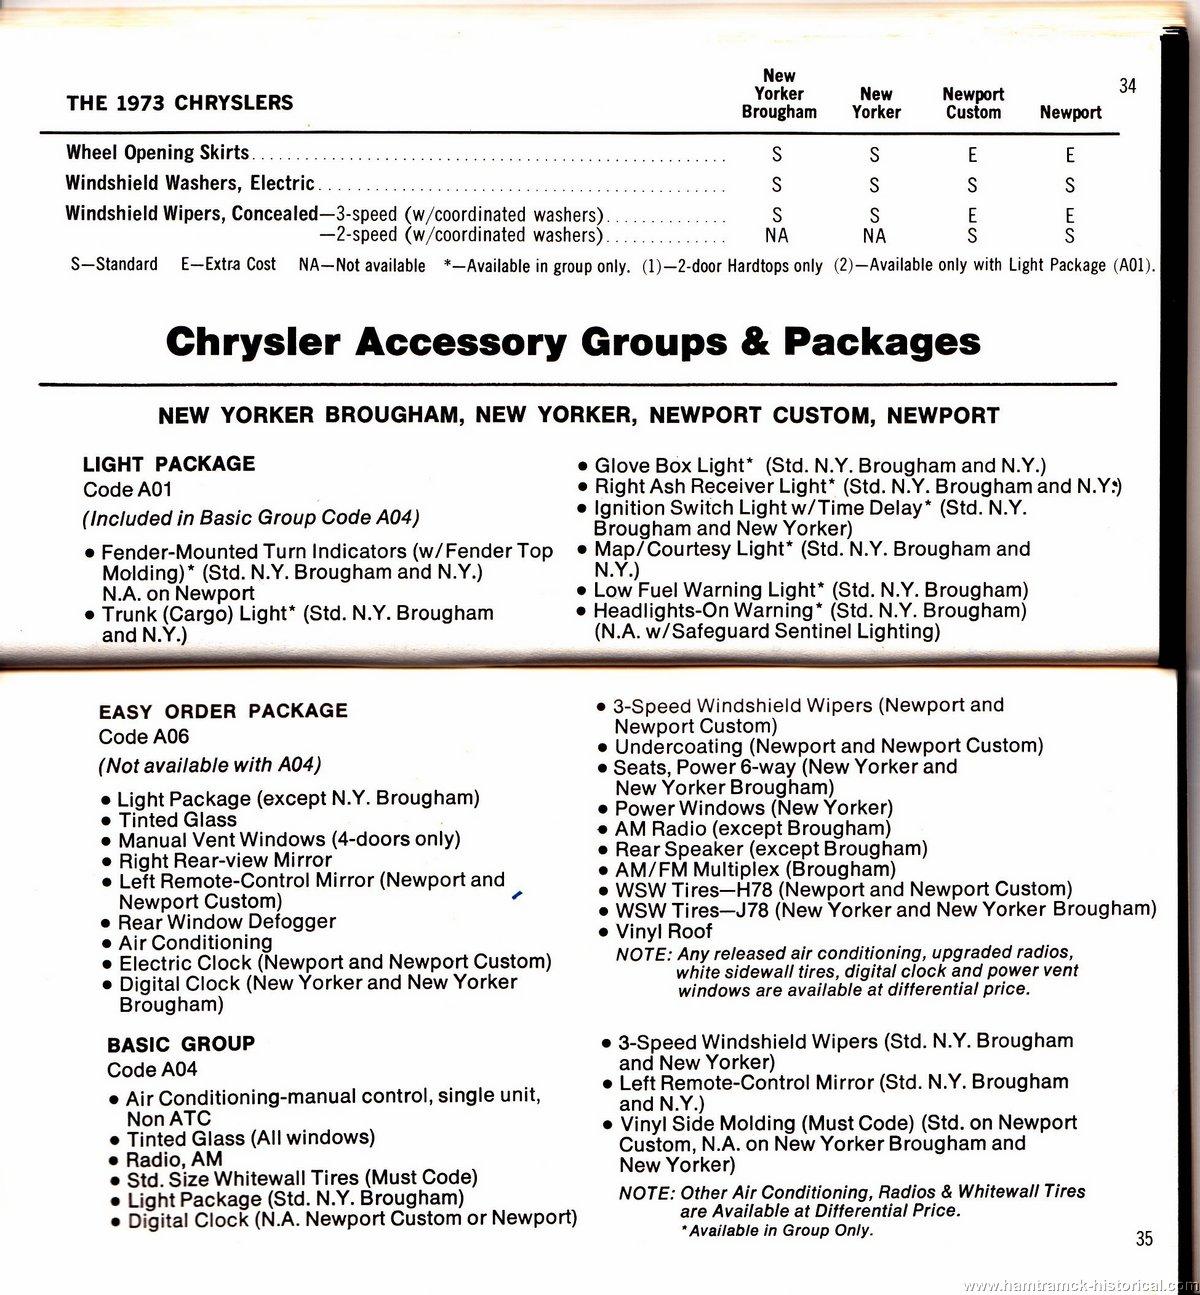 the 1970 hamtramck registry 1973 chrysler plymouth salesman s rh hamtramck historical com Sysco Food Order Guide 2018 chrysler pacifica order guide